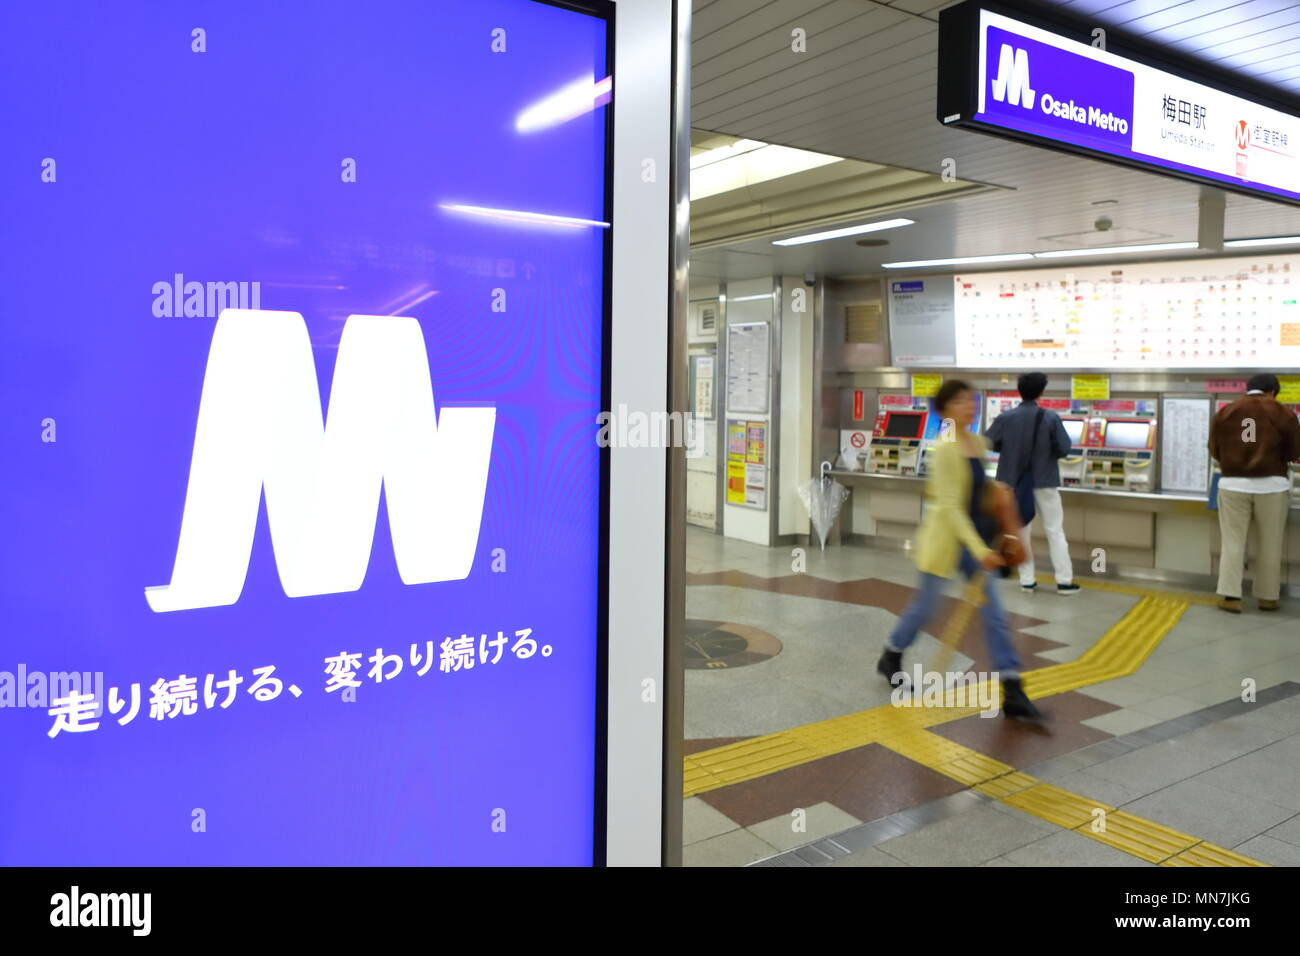 Monday. 7th May, 2018. Osaka Metro, the rapid transit network in Osaka, Japan on Monday, May 7, 2018. Osaka Municipal Subway was privatized on April 1 with the launch of Osaka Metro Co. Credit: Naoki Nishimura/AFLO/Alamy Live News - Stock Image